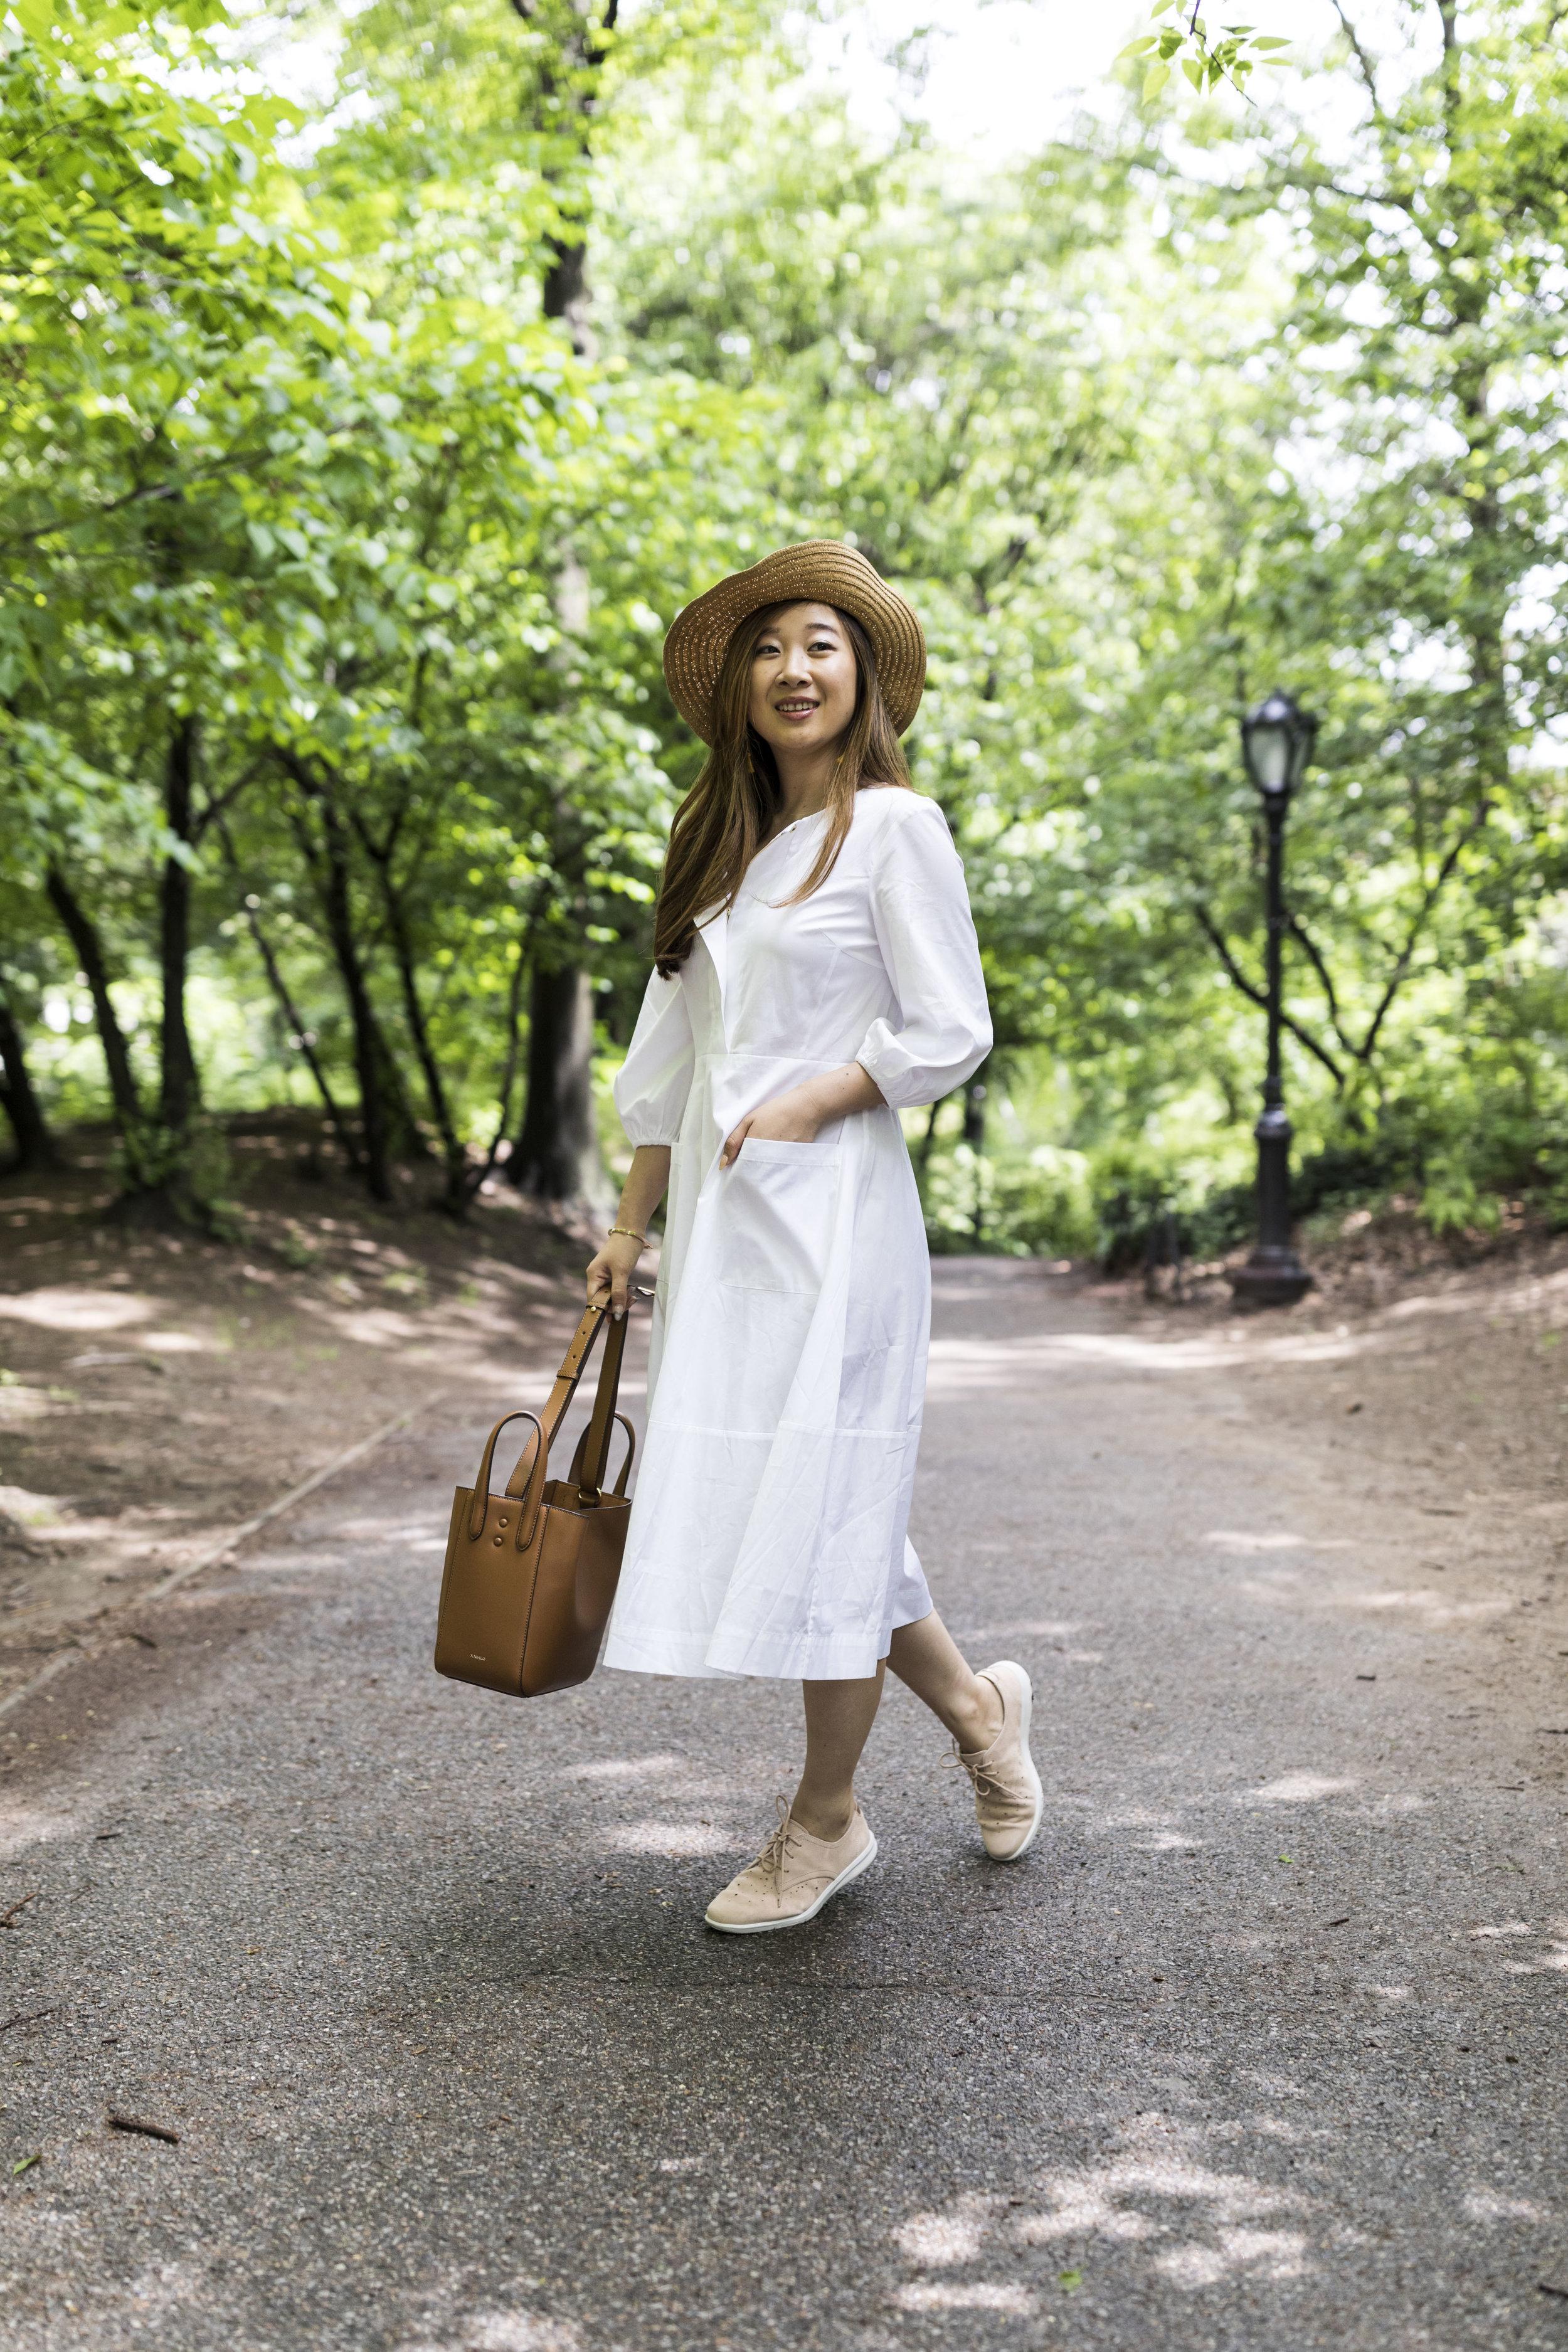 Dress:Cuyana; Bag: X Nihilo. Photos by Ashley Gallerani.